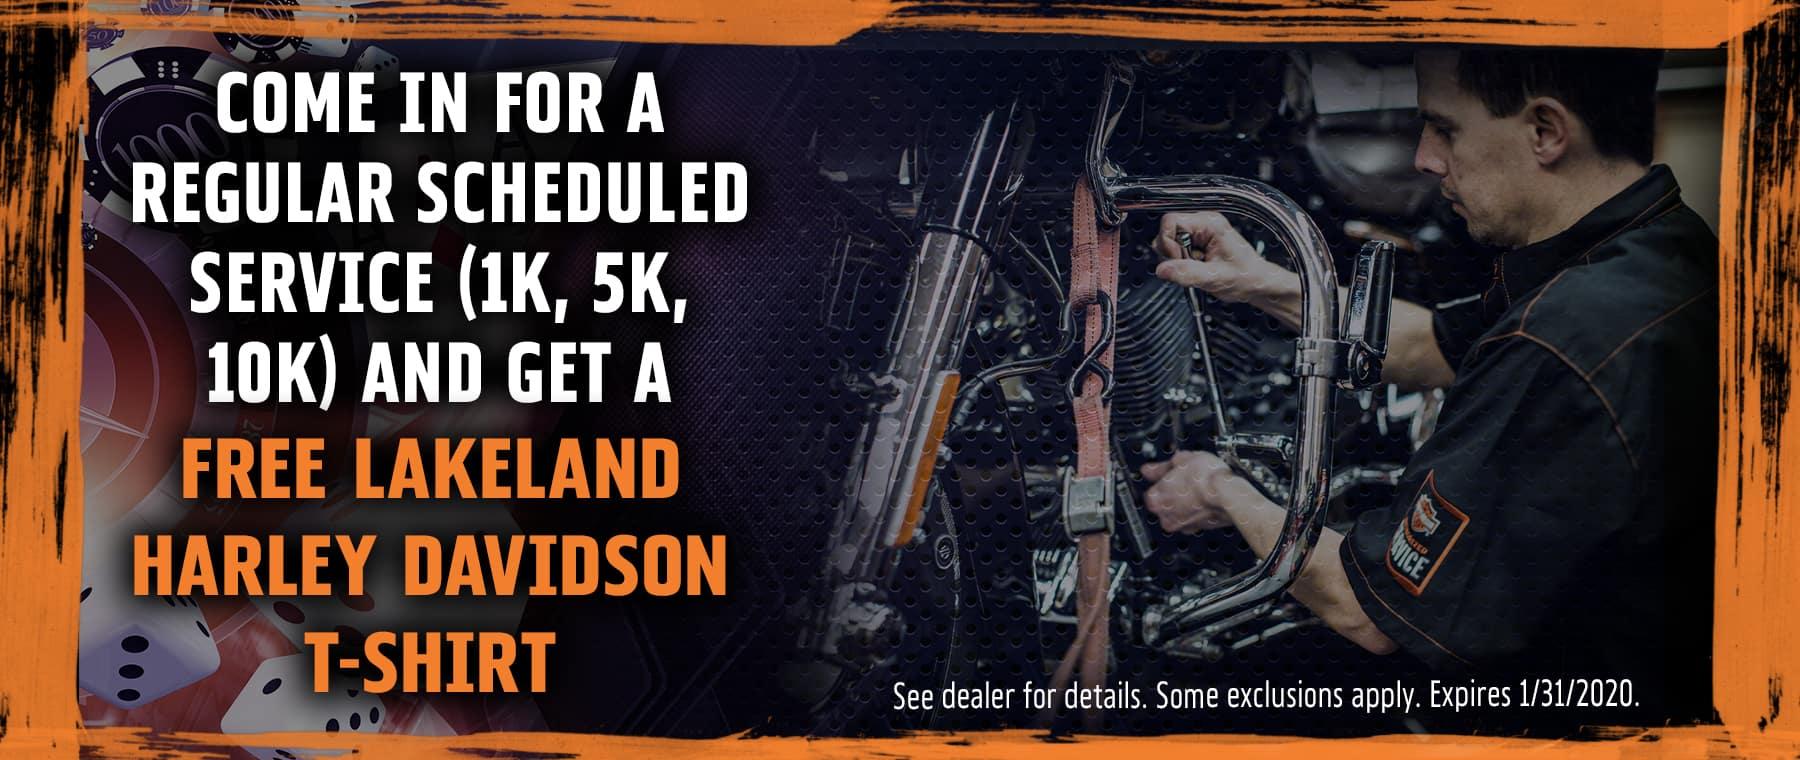 Get a FREE Lakeland Harley Davidson T-Shirt